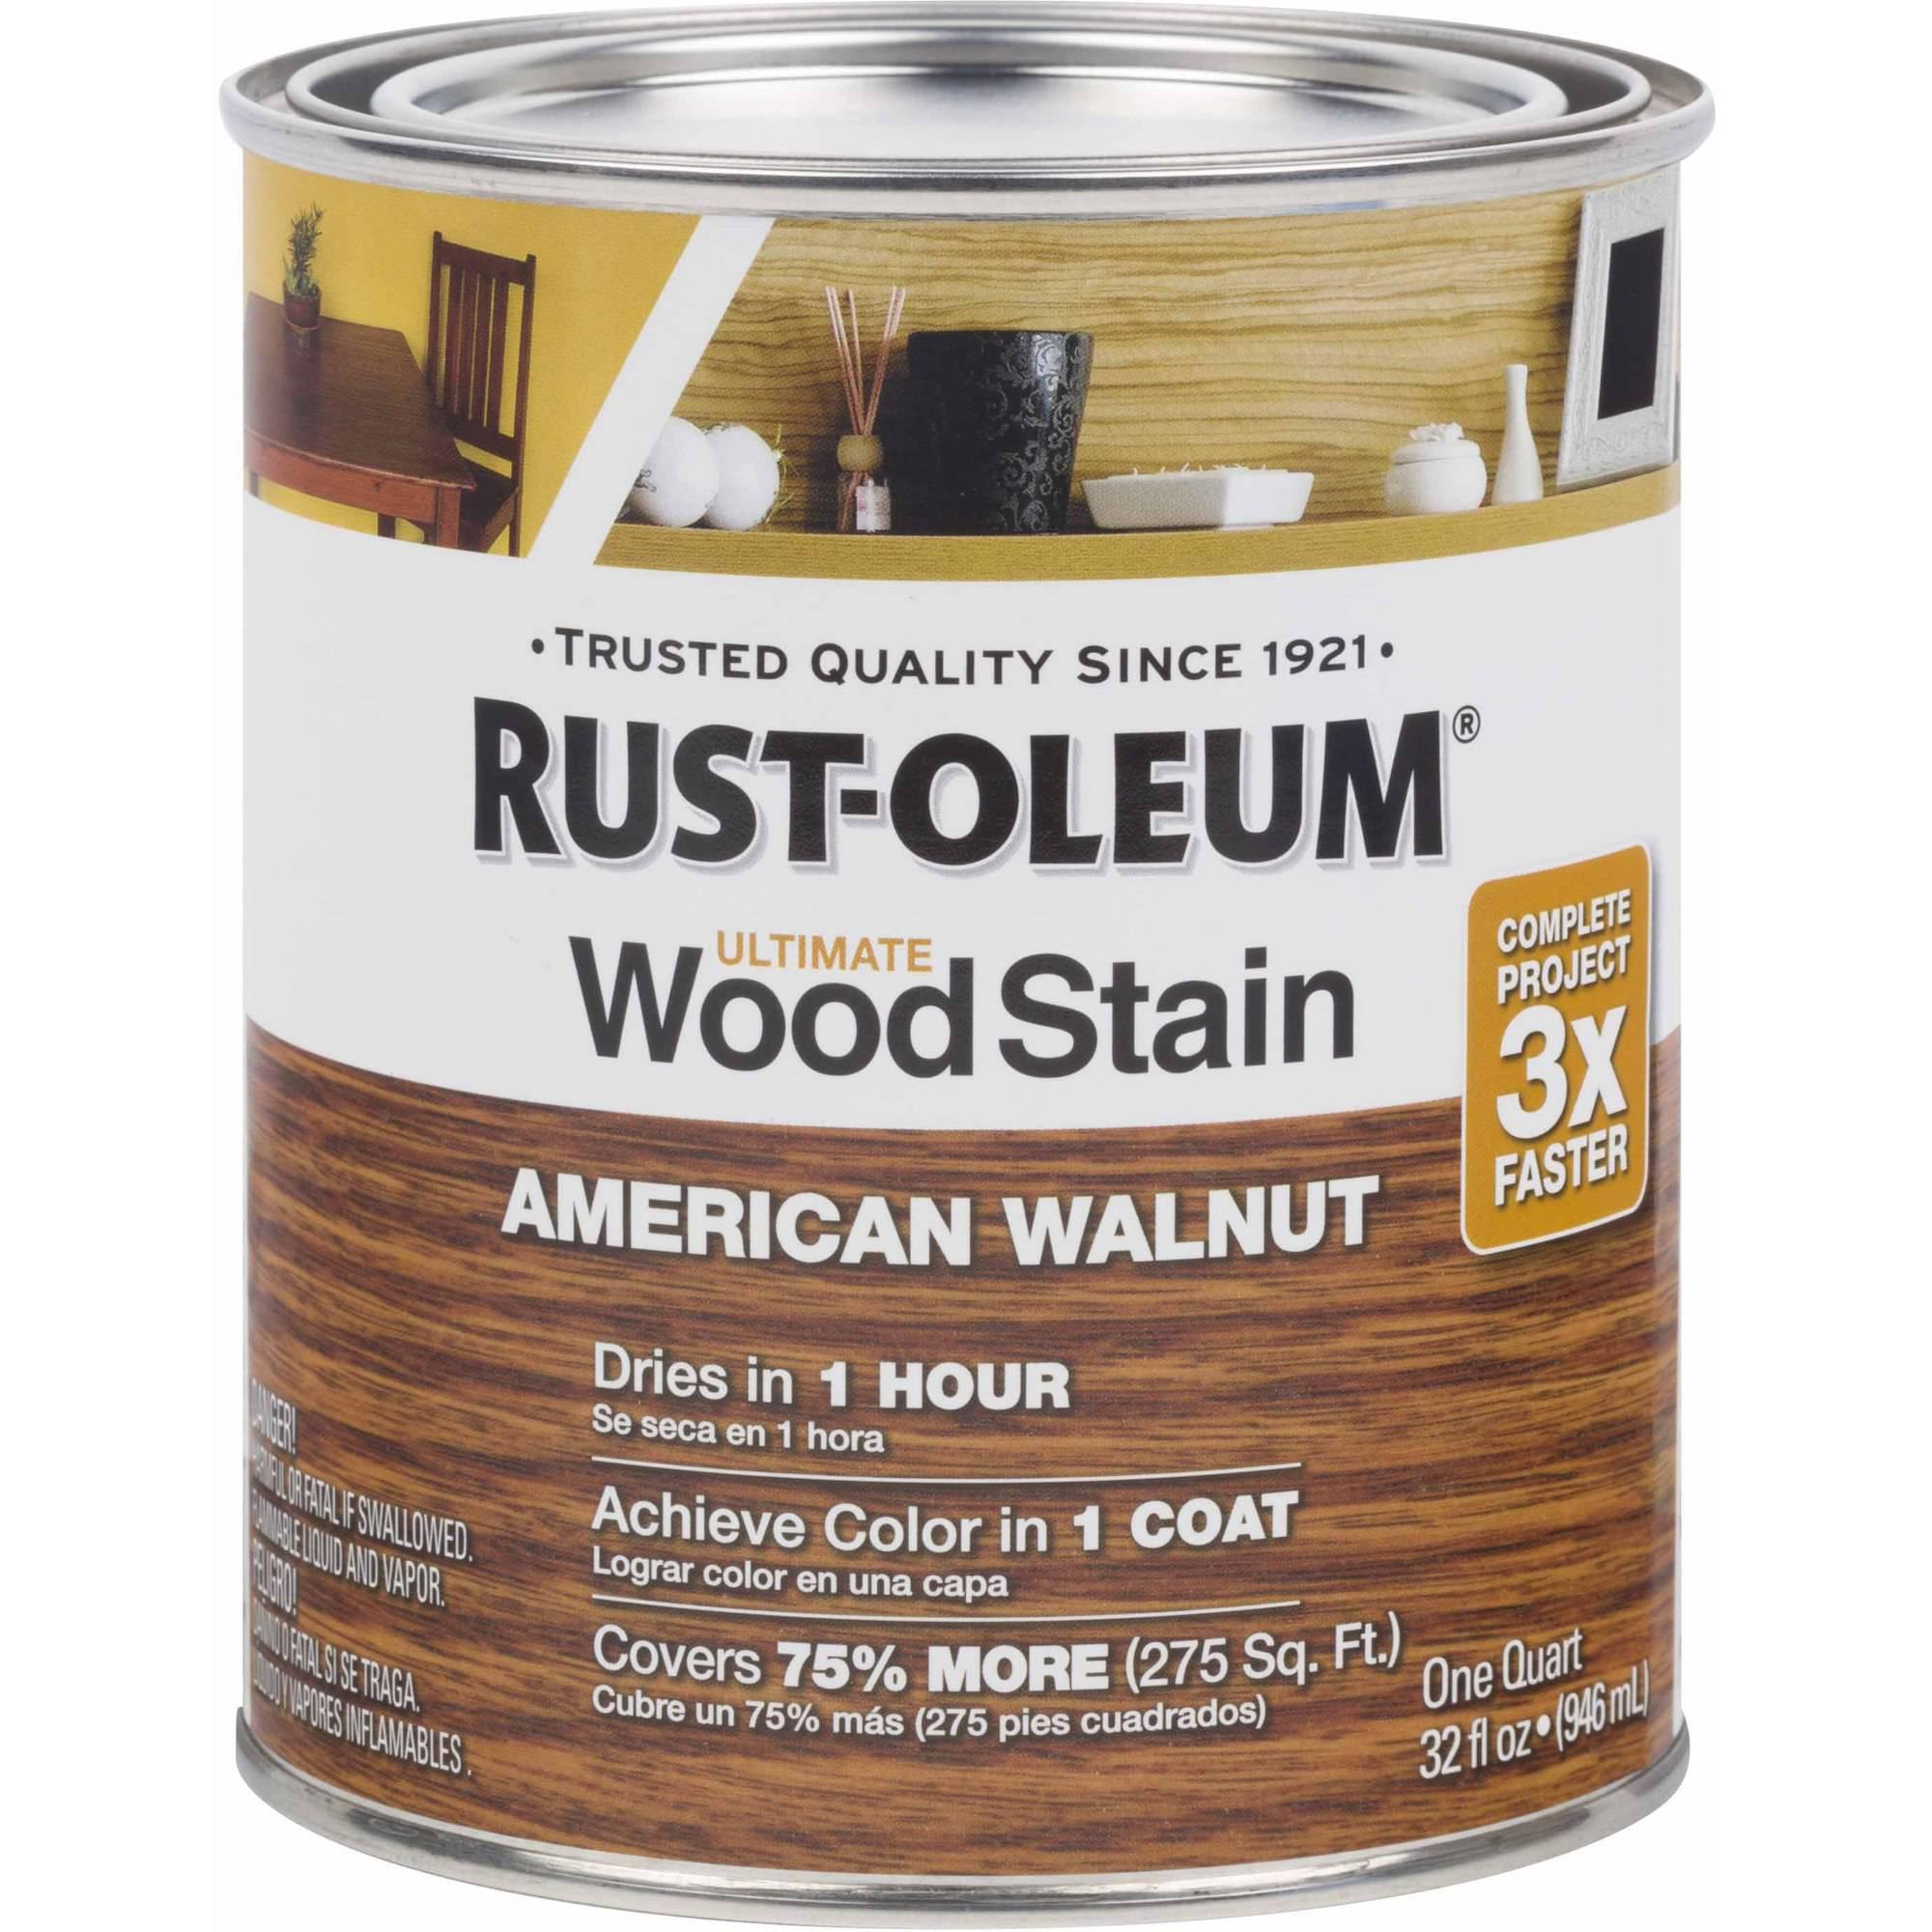 Rust-Oleum Ultimate Wood Stain Quart, American Walnut